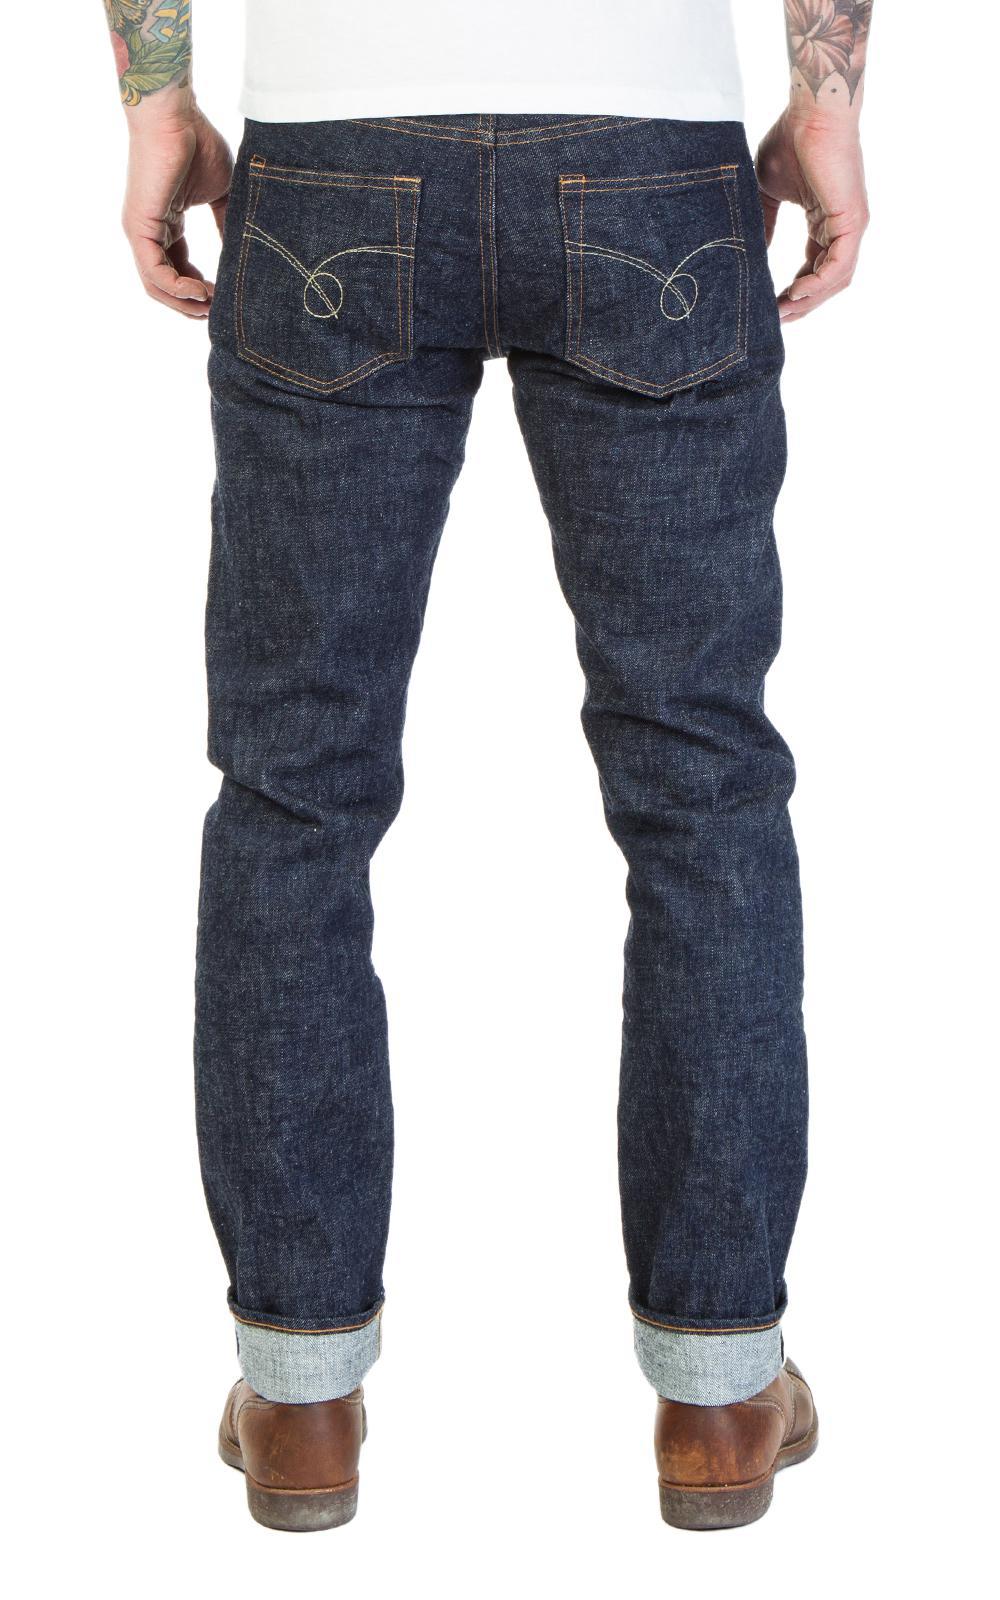 Japan Blue Jeans Cotton Jb7700 Côte D'ivoire Selvage Indigo Rinsed 13.5oz in Blue for Men